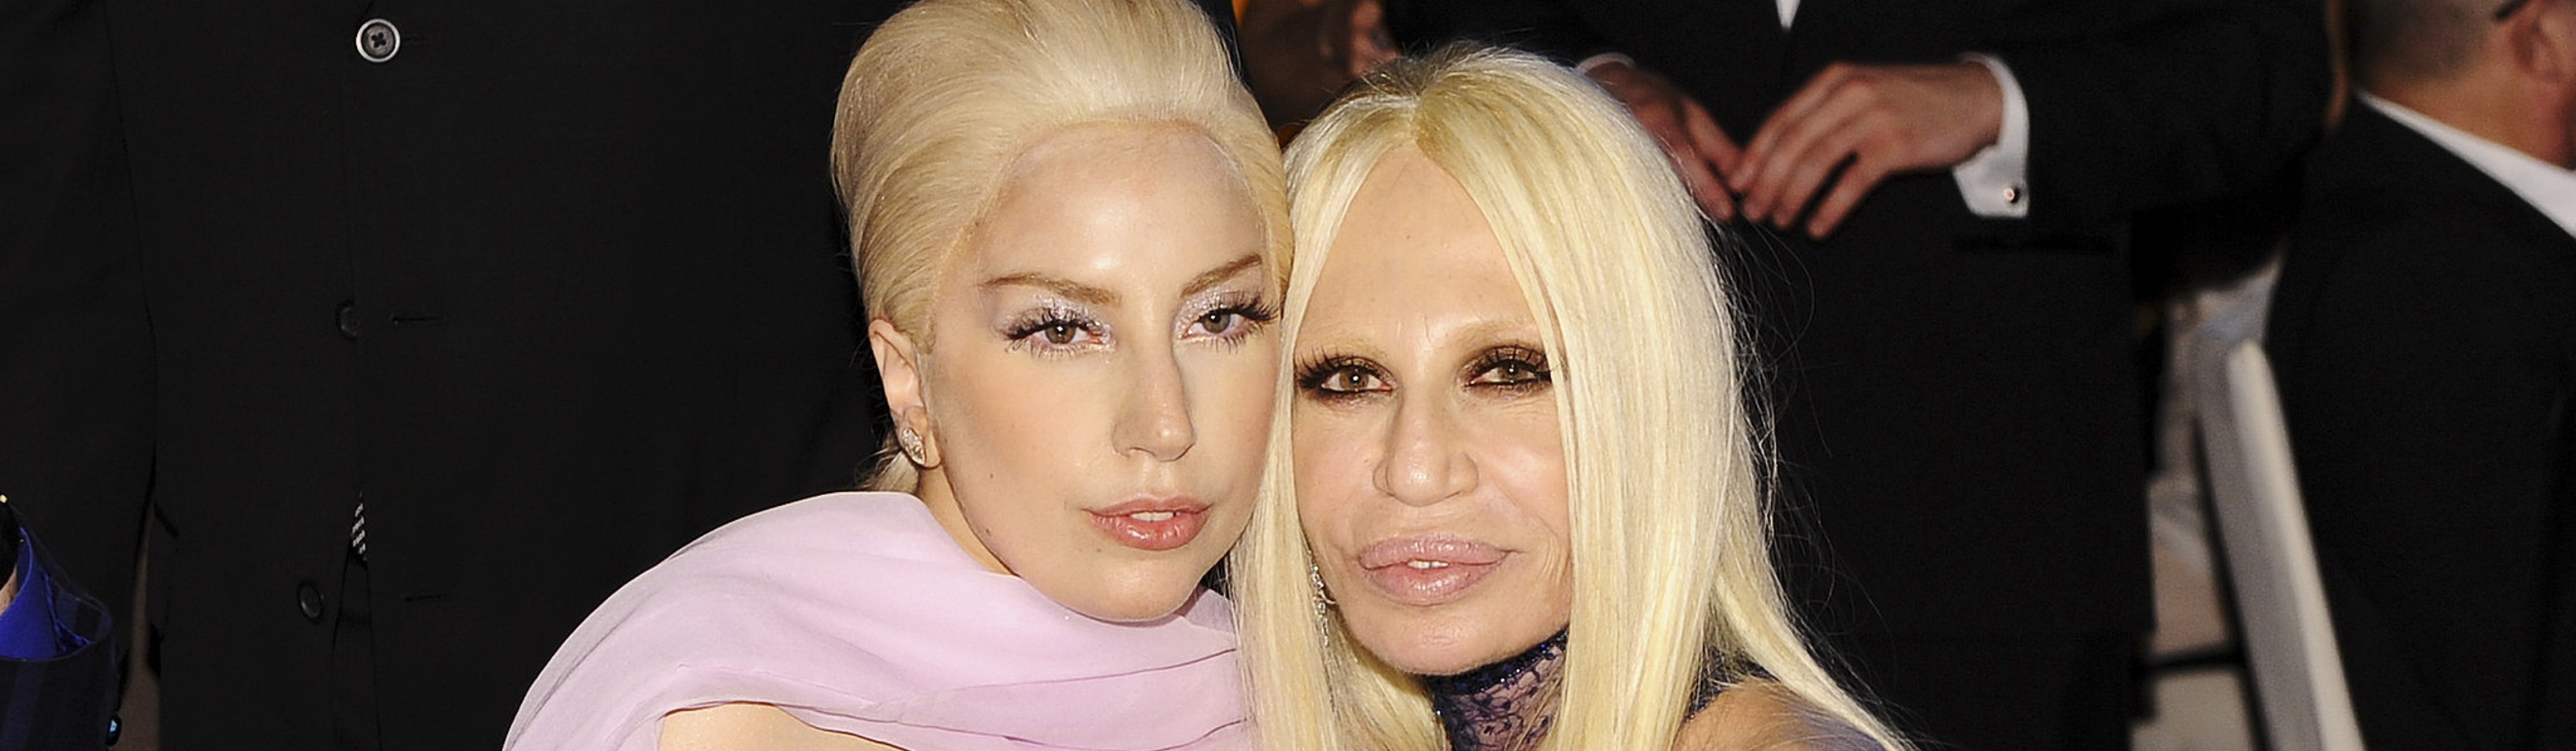 Lady Gaga to Play Donatella Versace in Upcoming Drama